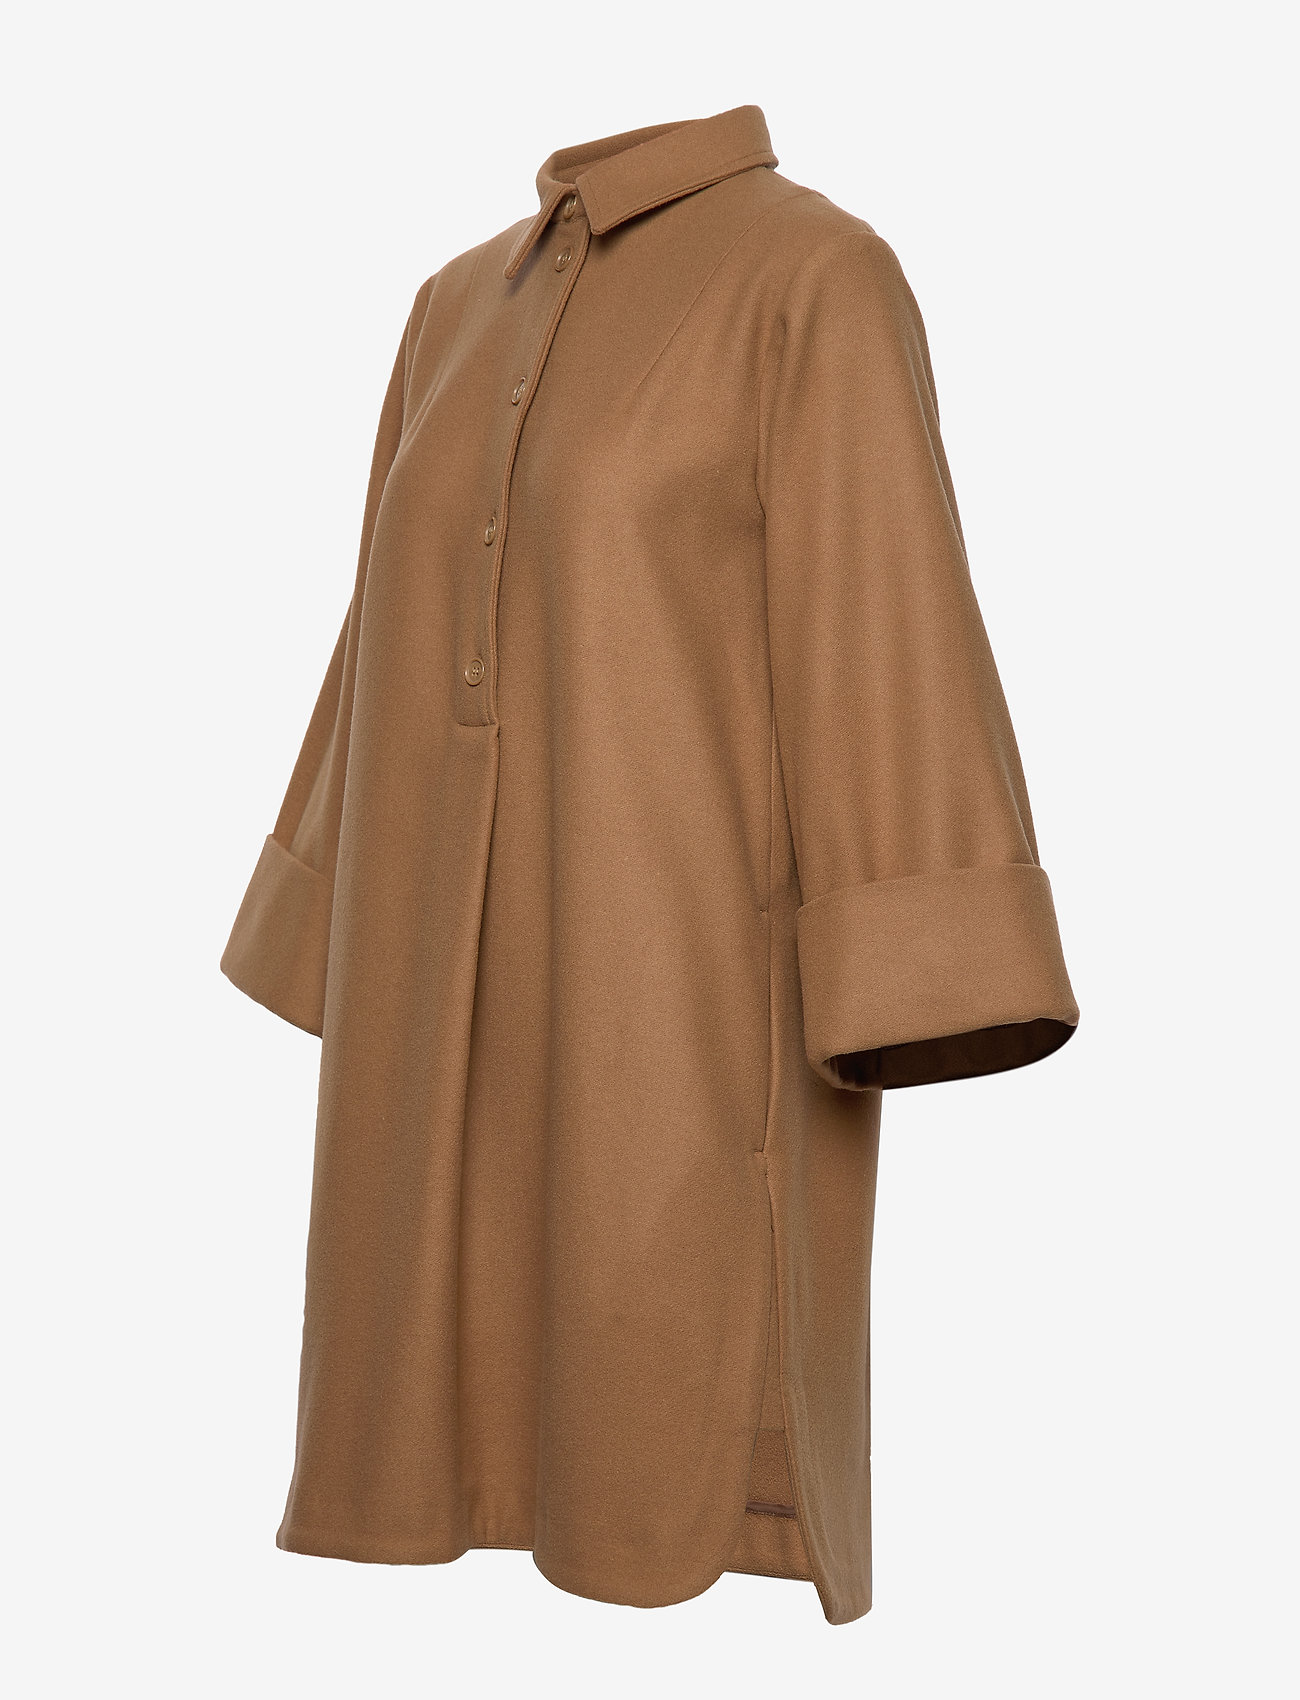 Margot Dress (Camel) - nué notes r5BEJA